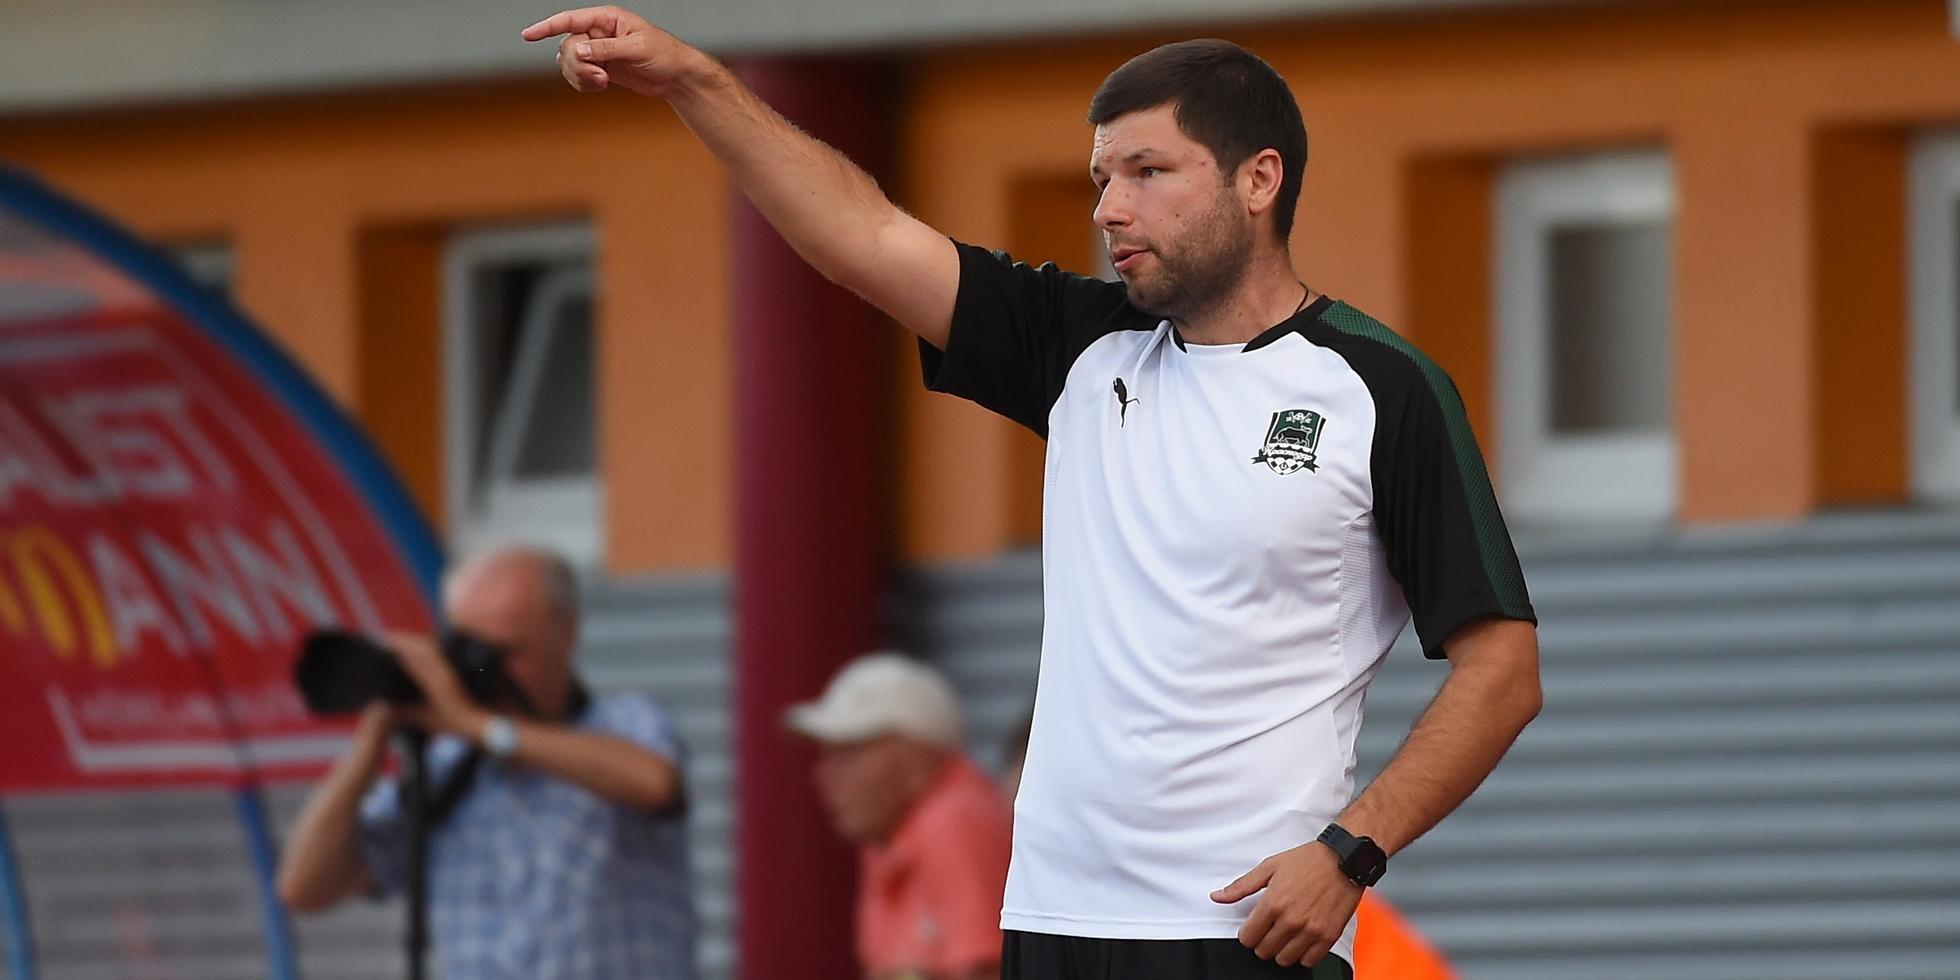 Исполняющим обязанности главного тренера «Краснодара» назначен Мурад Мусаев